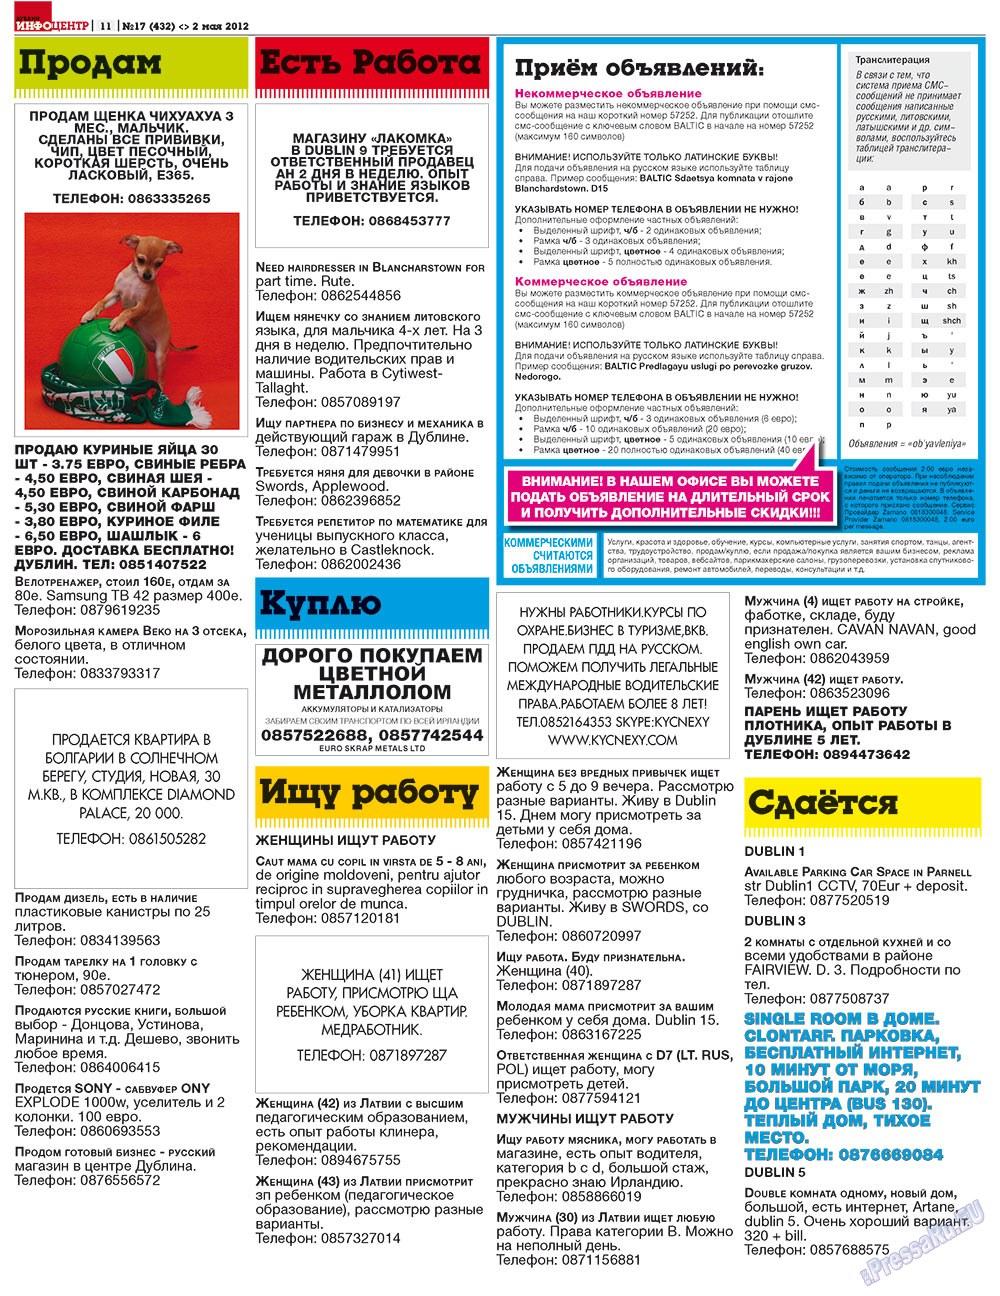 Дублин инфоцентр (газета). 2012 год, номер 17, стр. 11